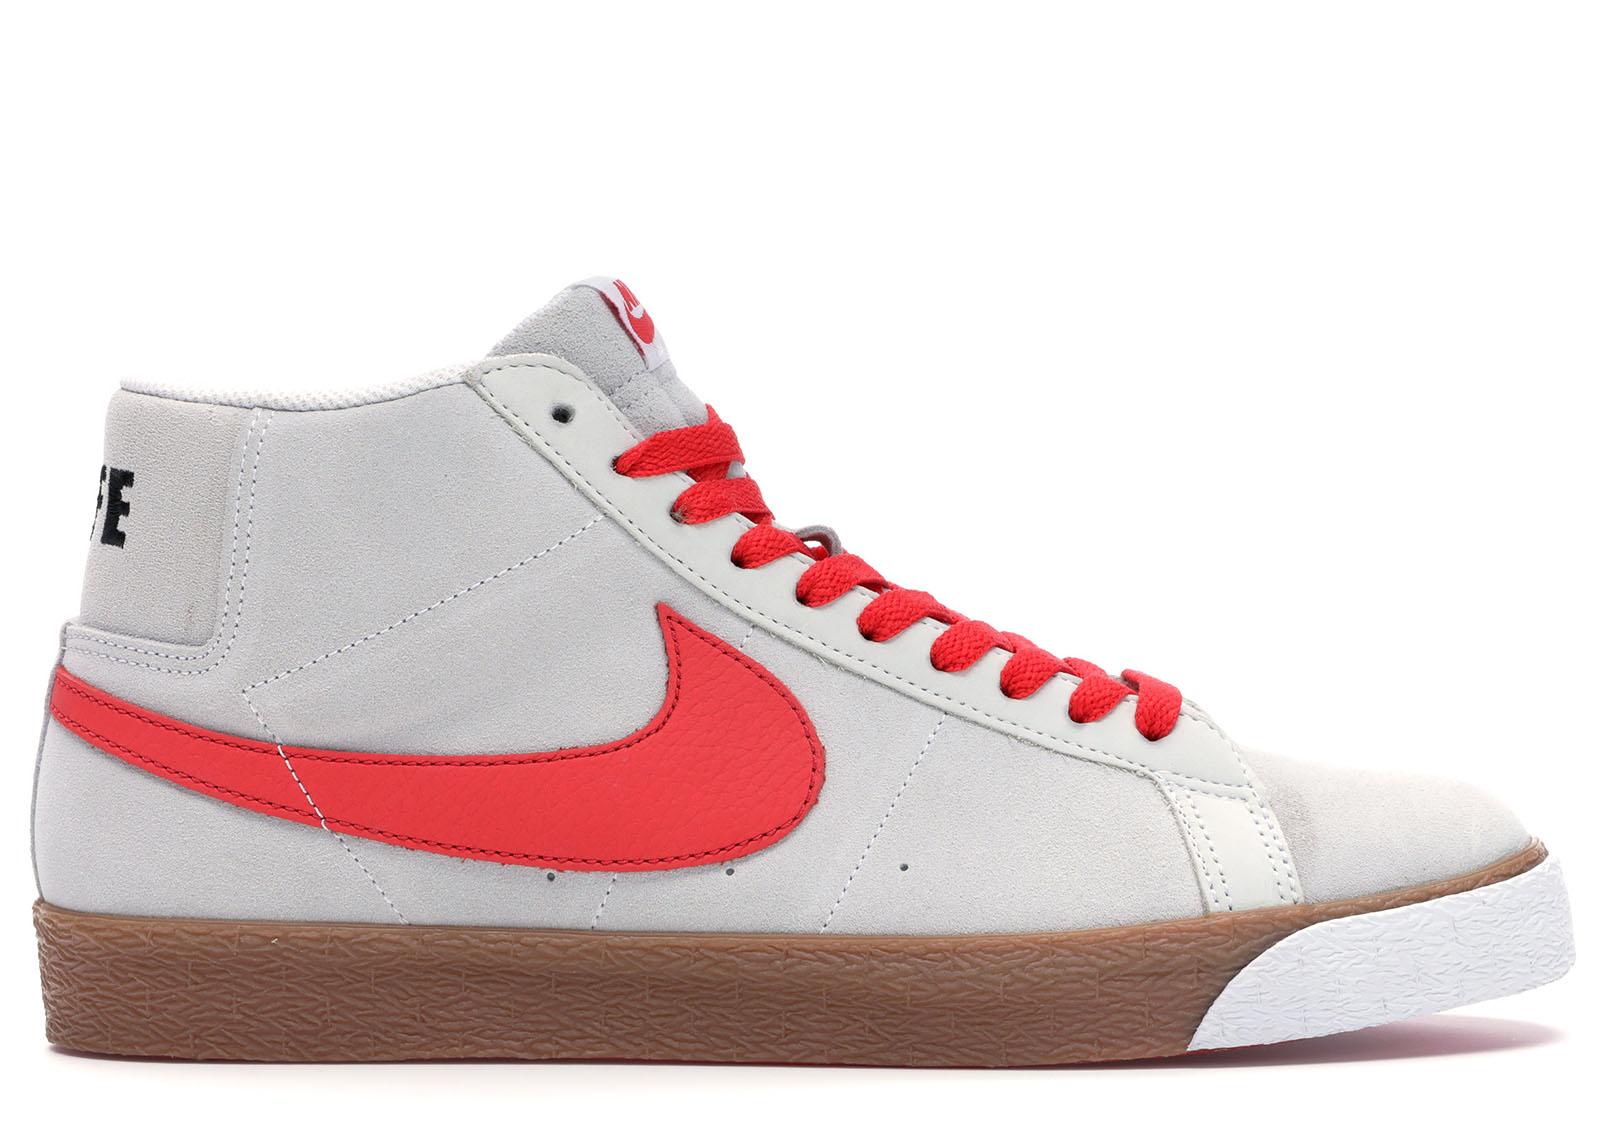 Nike SB Blazer Swoosh Life - 314070-161